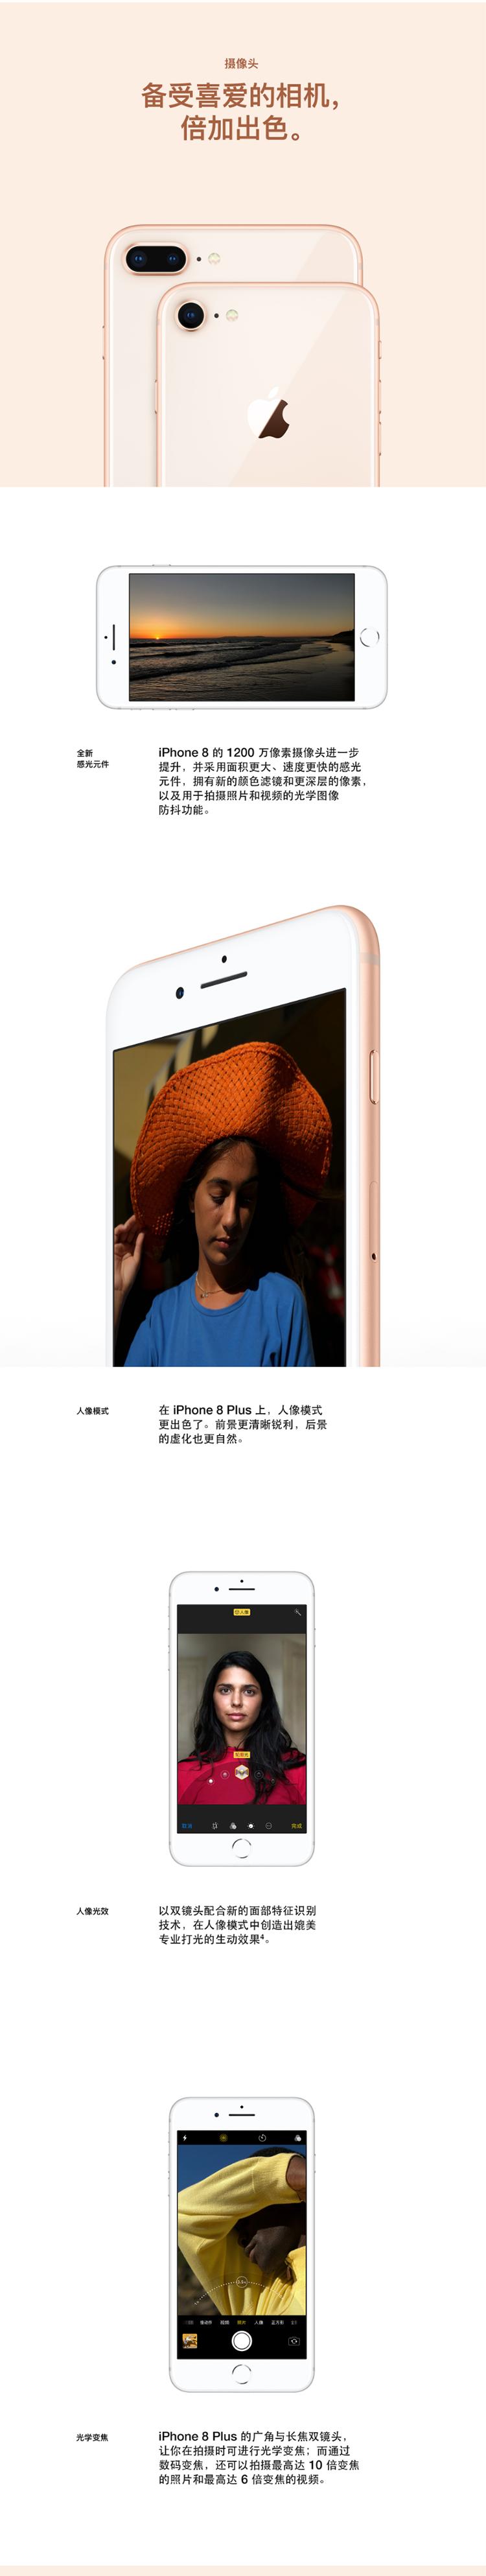 iPhone8pic4.jpg